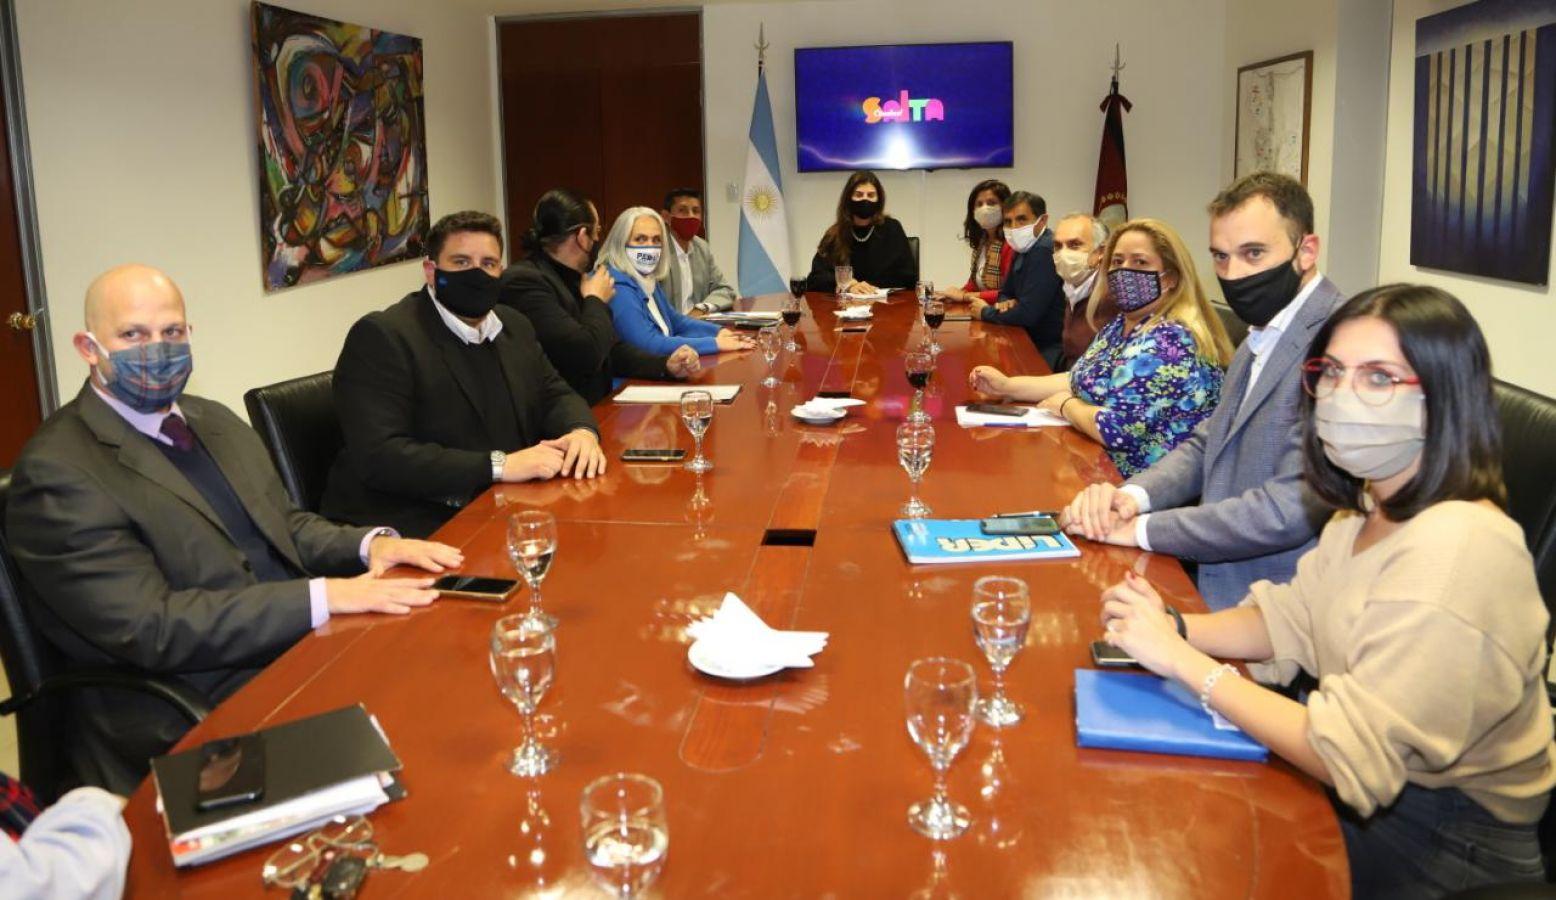 bettina concejales concejo dialogo ediles